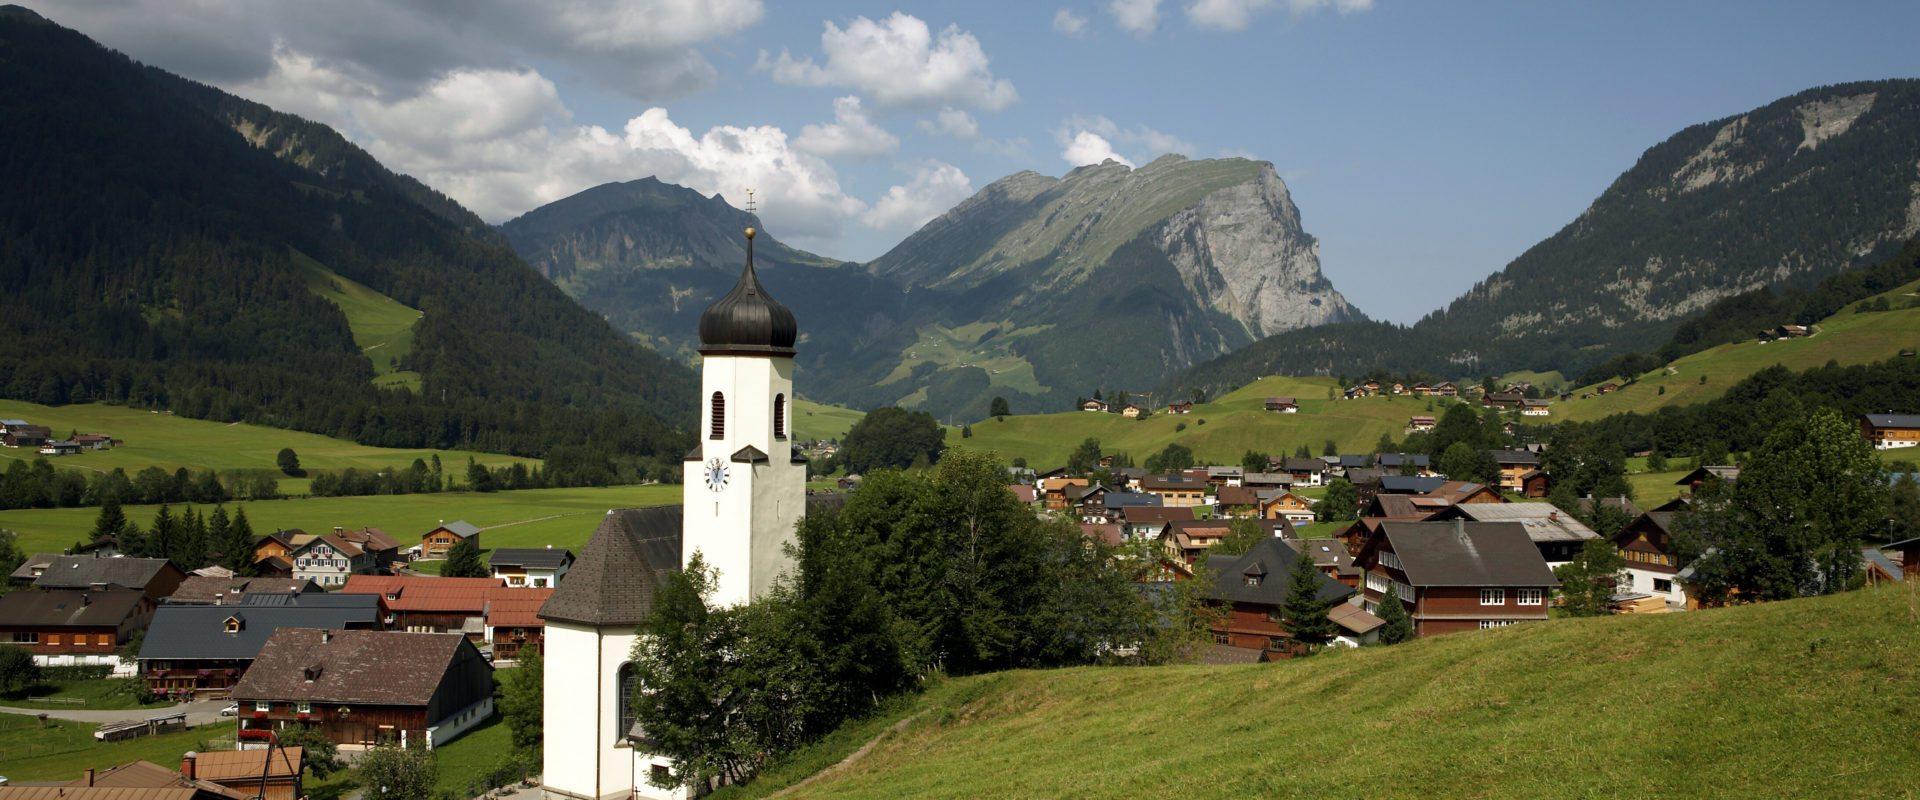 Schoppernau (c) Christoph Lingg - Bregenzerwald Tourismus